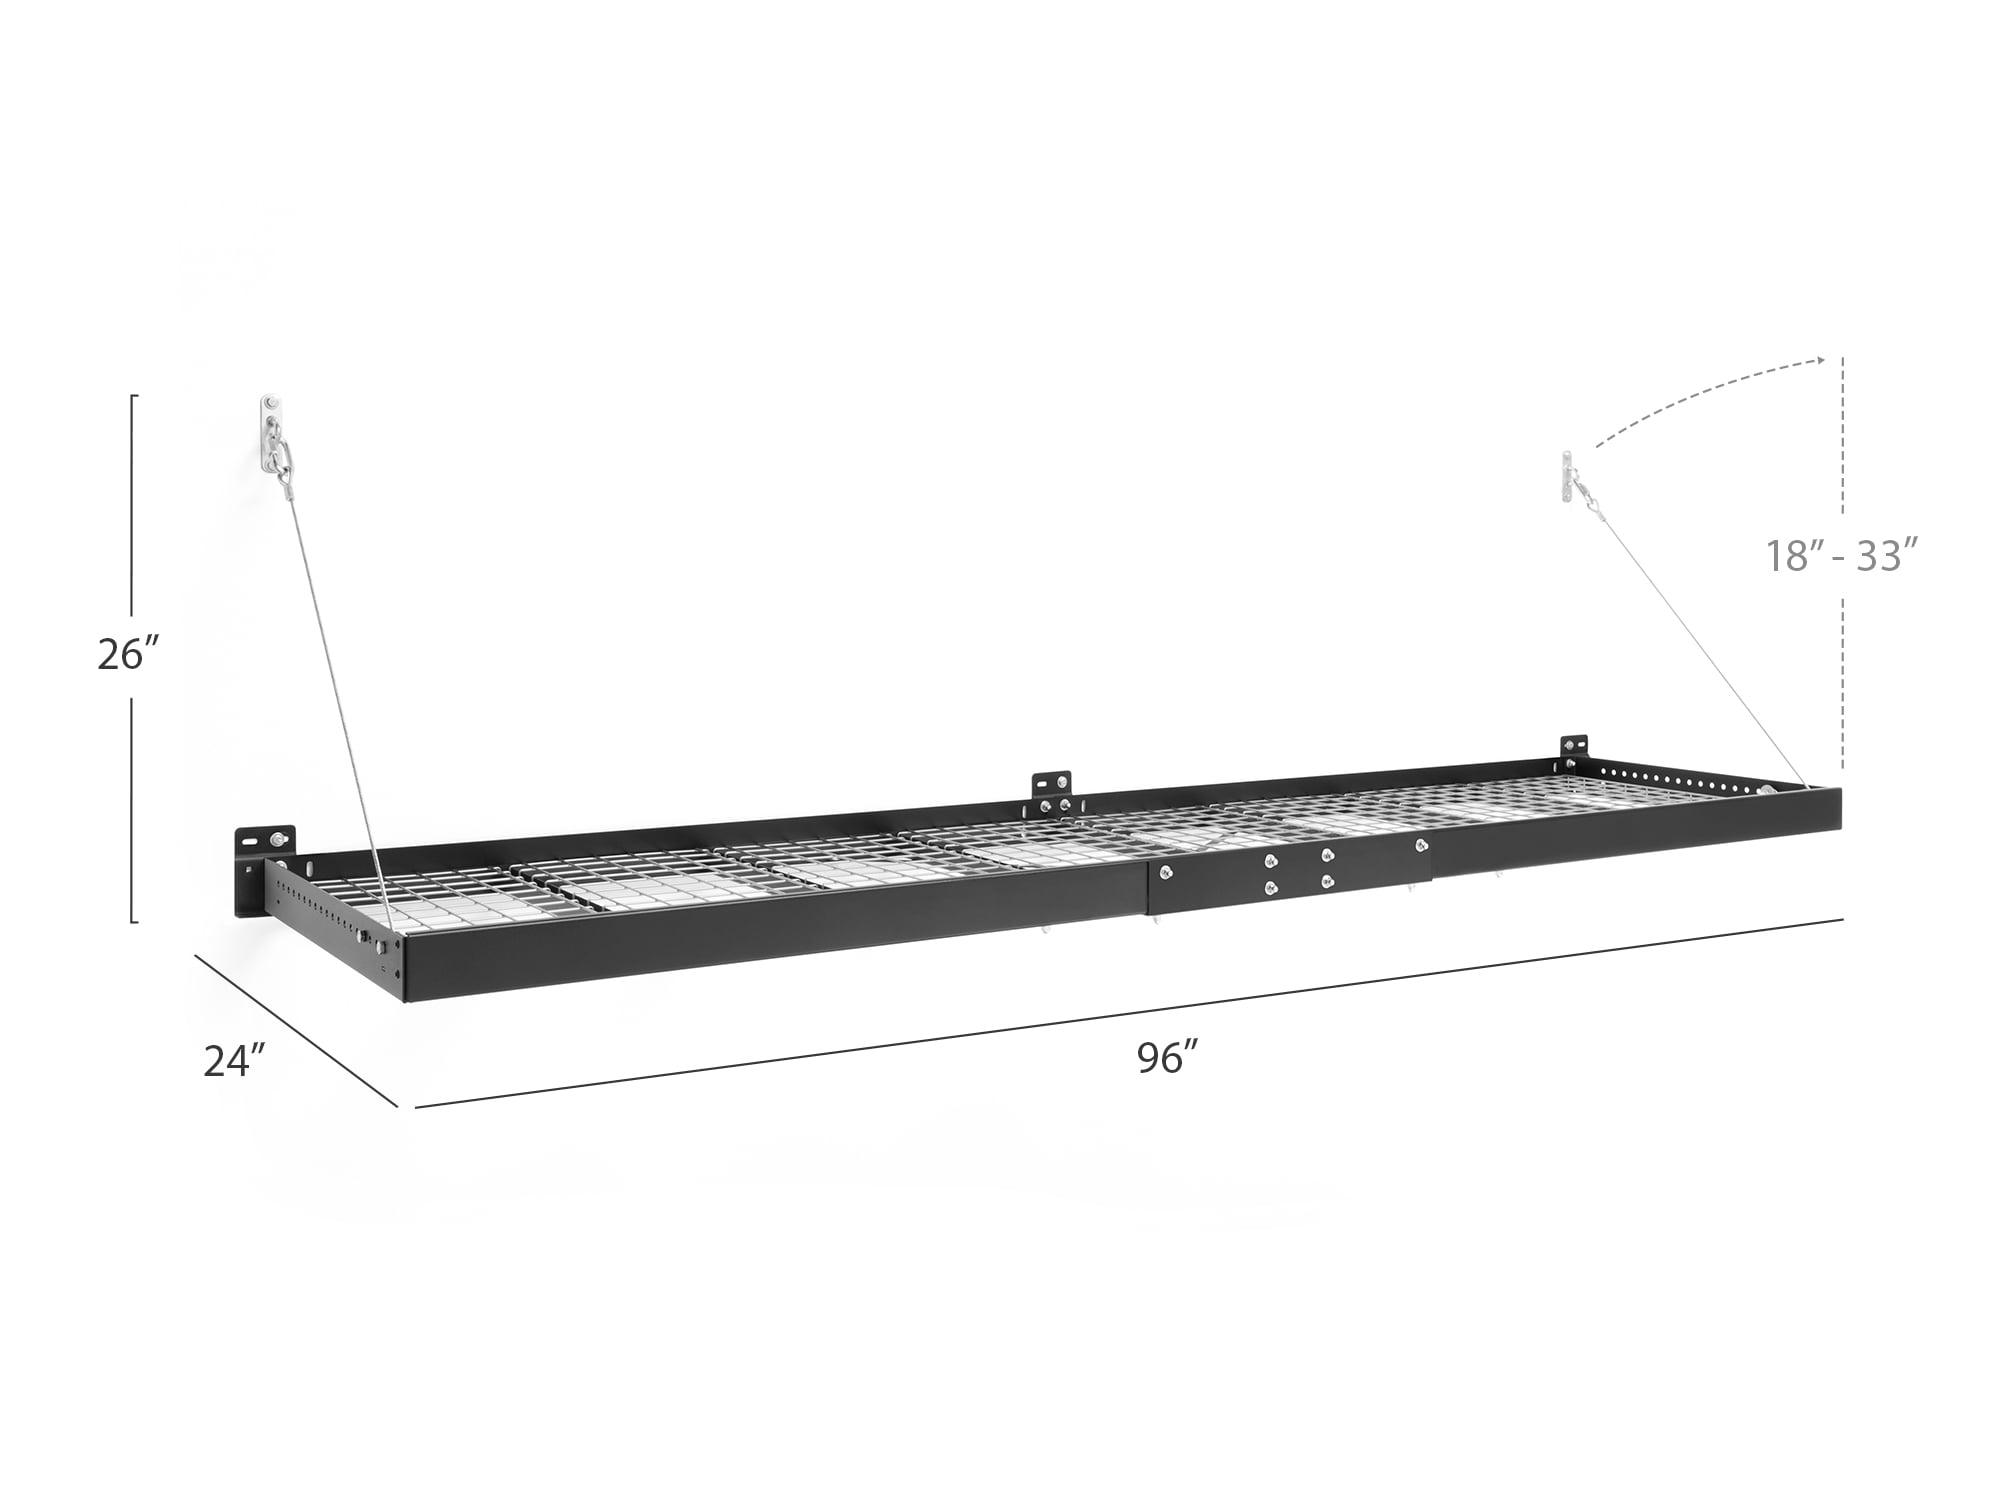 40408 Wall Mounted Steel Shelf Set /& 2 NewAge Products Pro Series Black 4 x 8 x 8 Garage Overheads